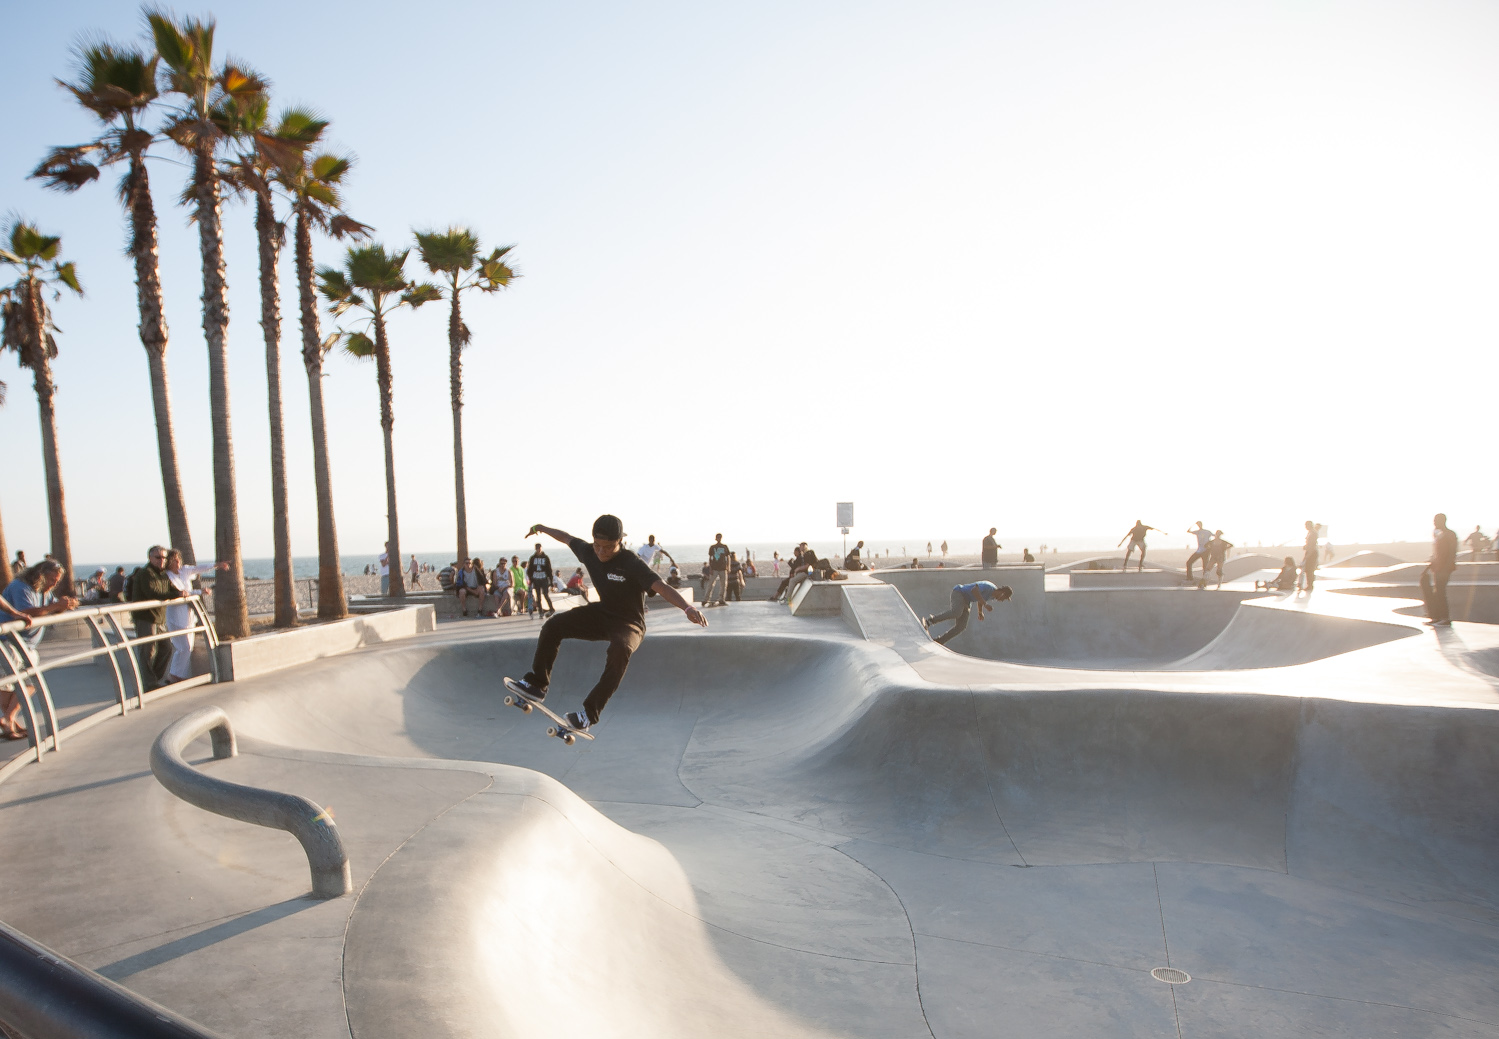 Christian-Schaffer-Los-Angeles-Hollywood-Venice-Beach-Skate-005.jpg